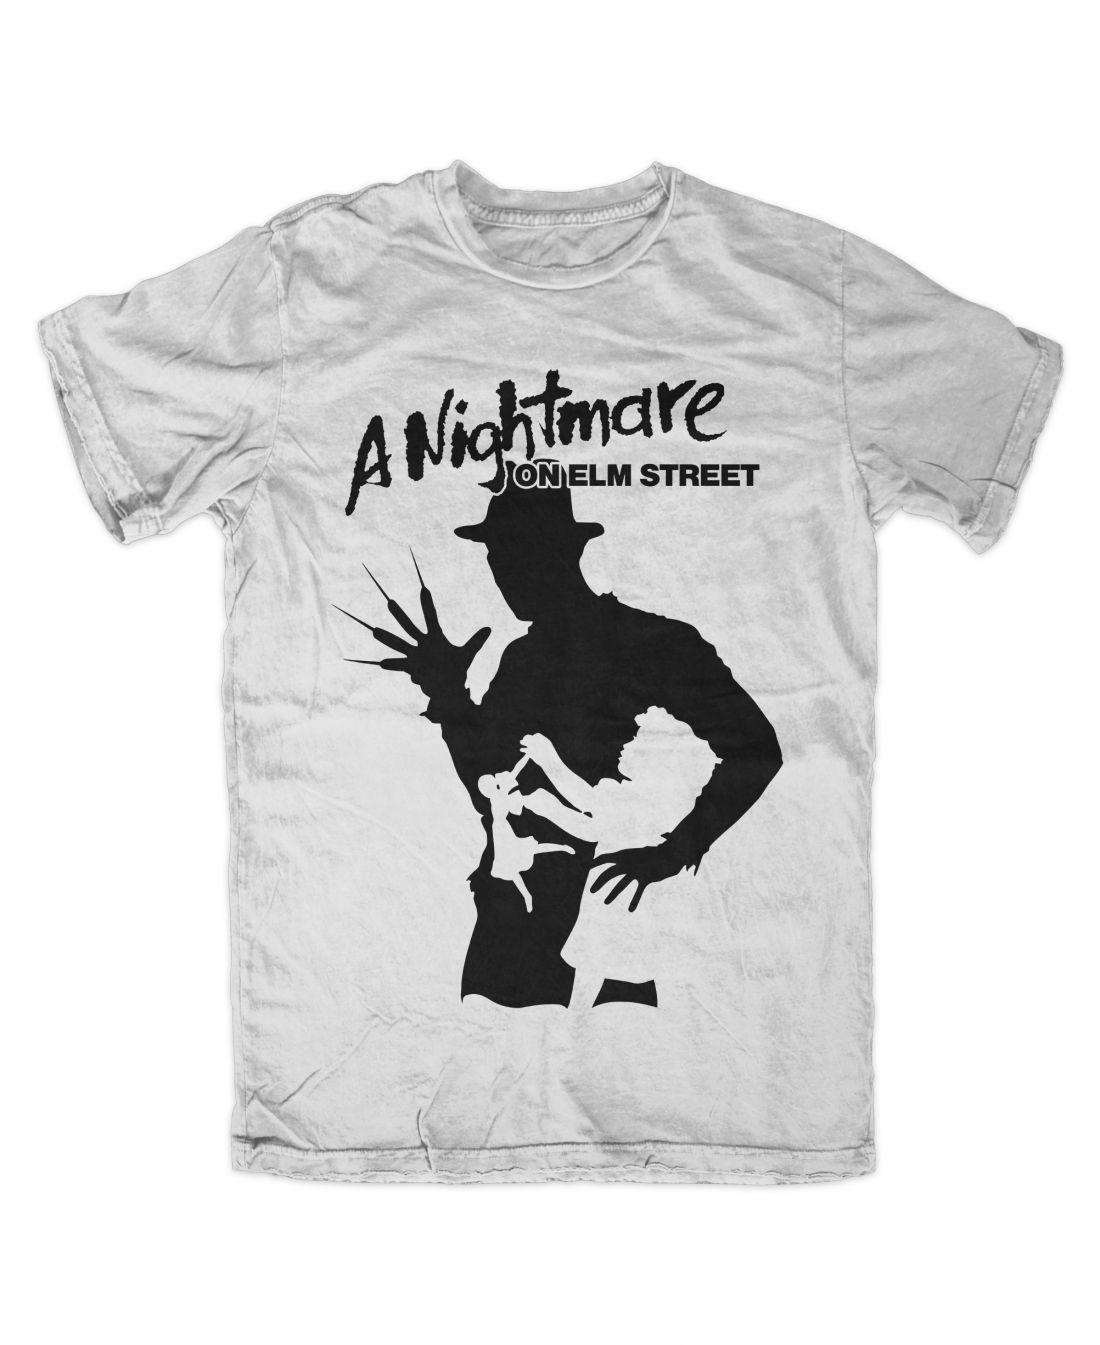 A Nightmare On Elm Street 001 (fehér póló)